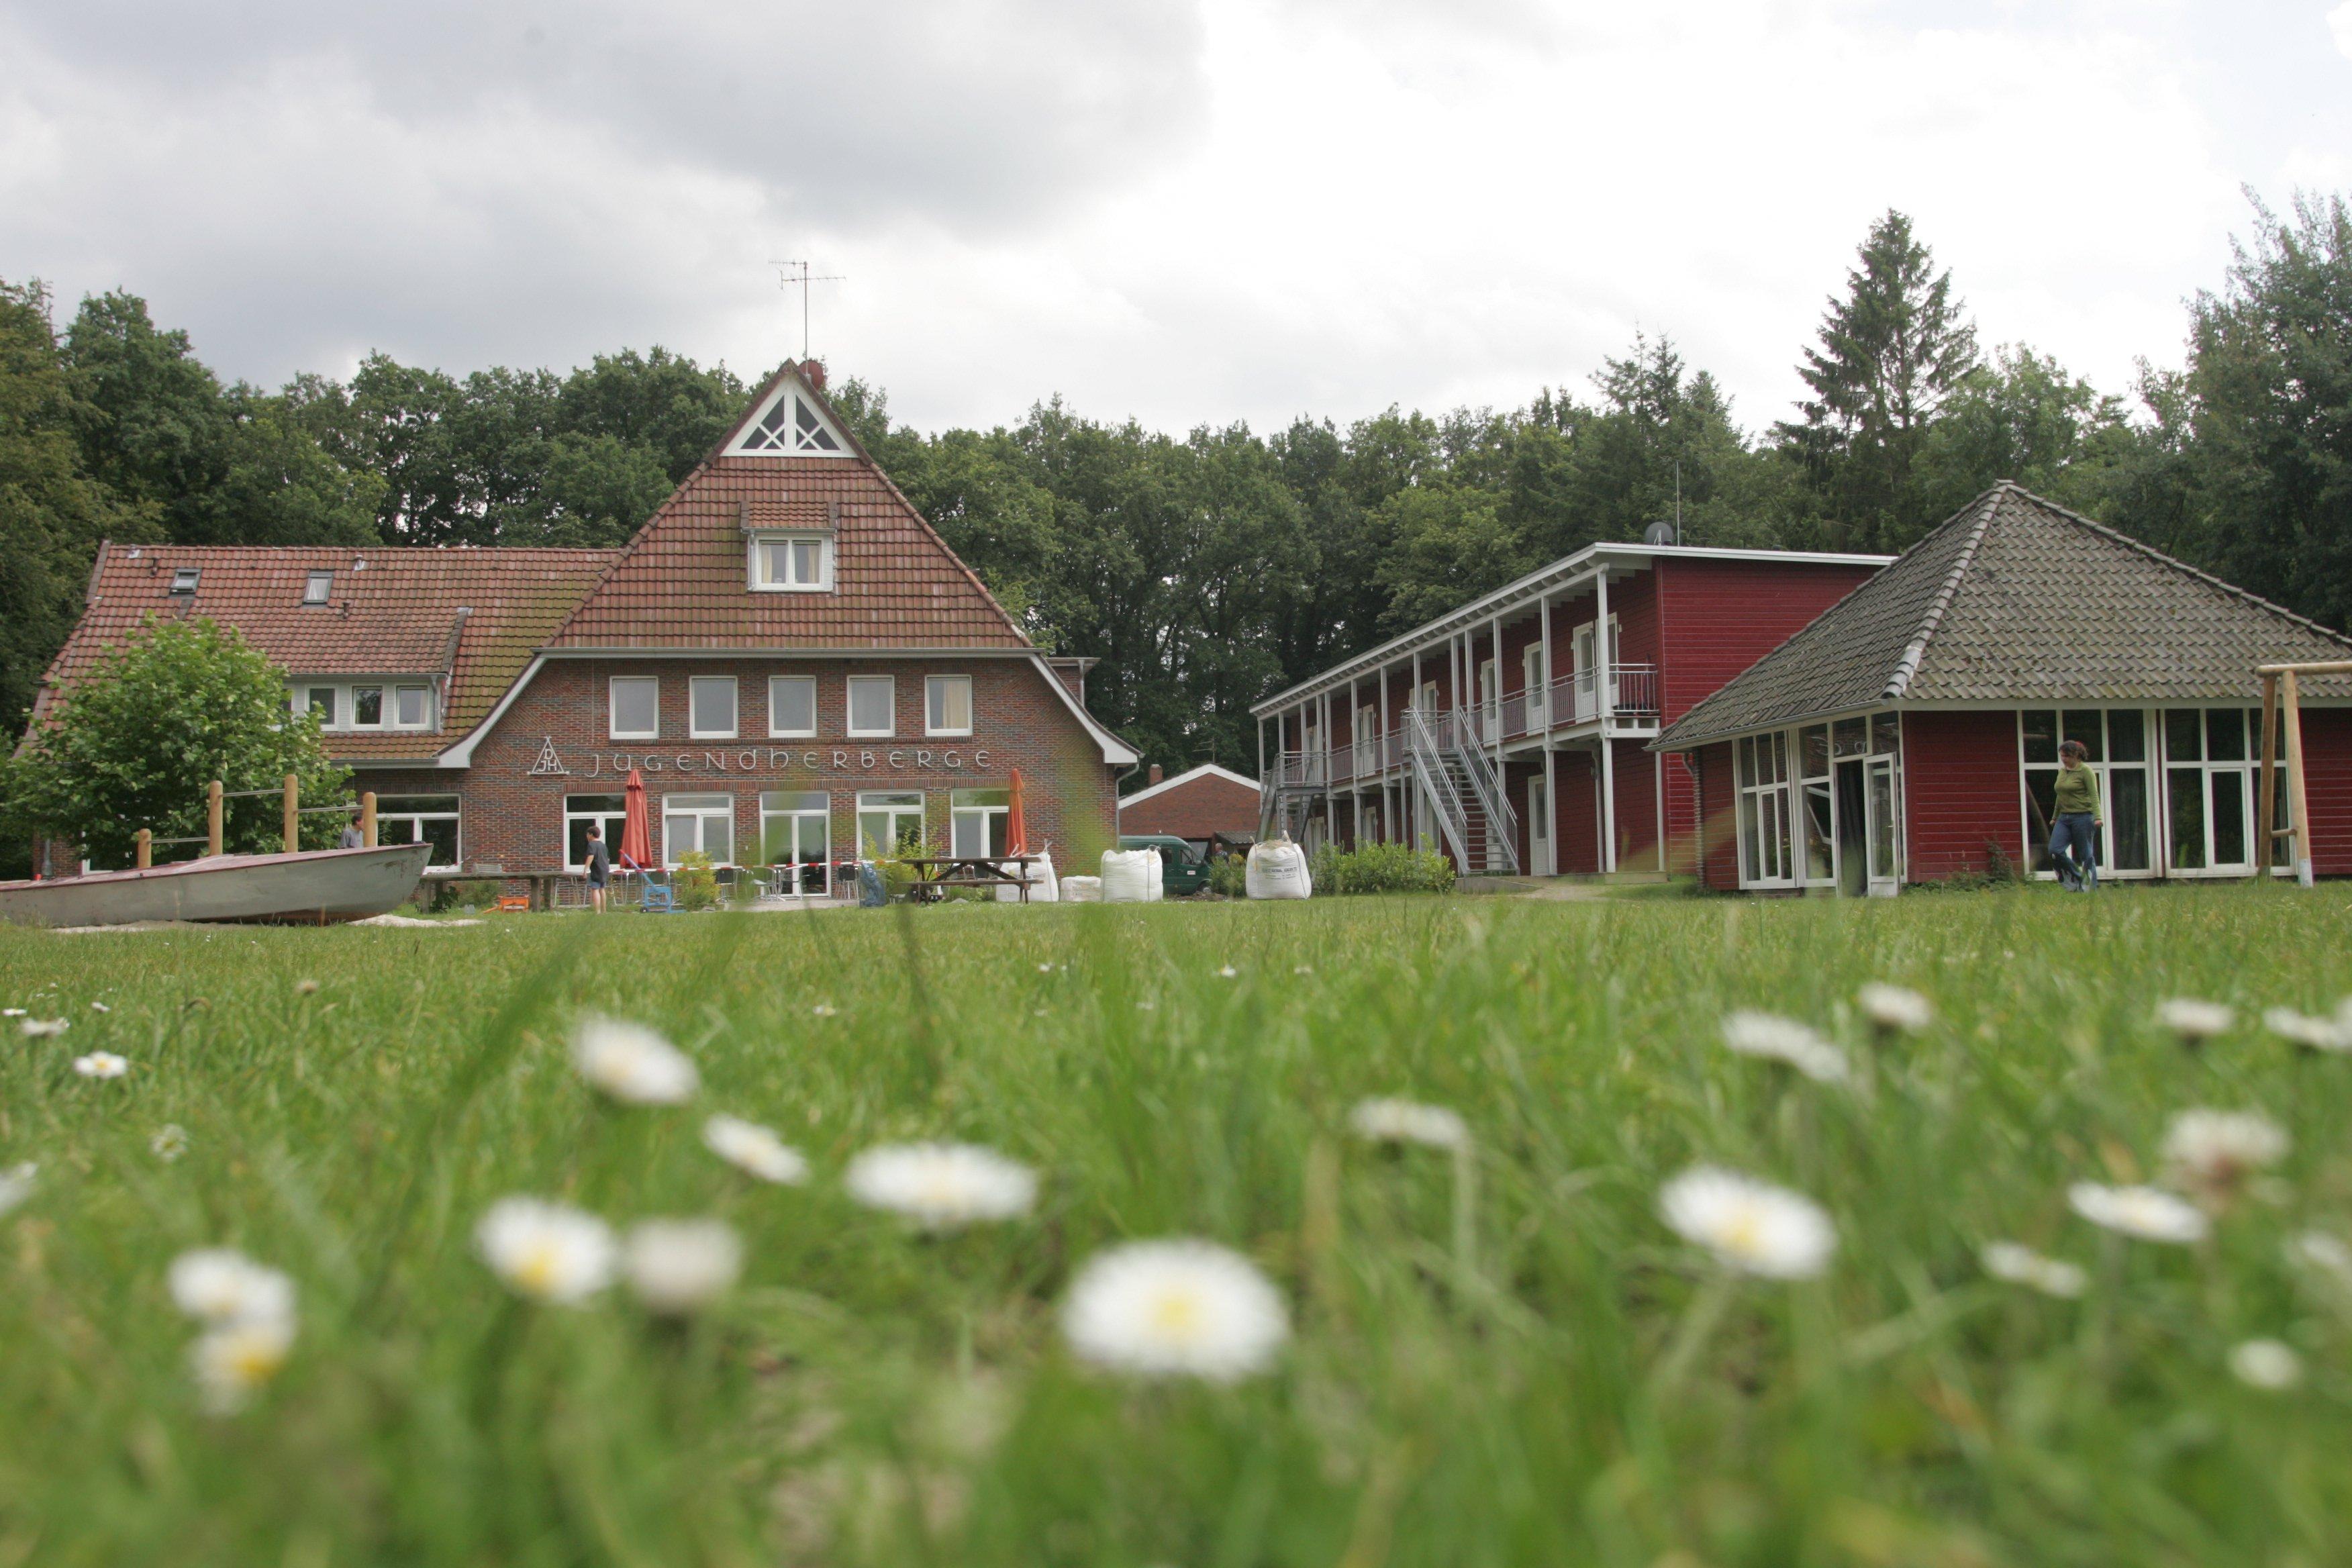 Offene Stellen Bad KiГџingen